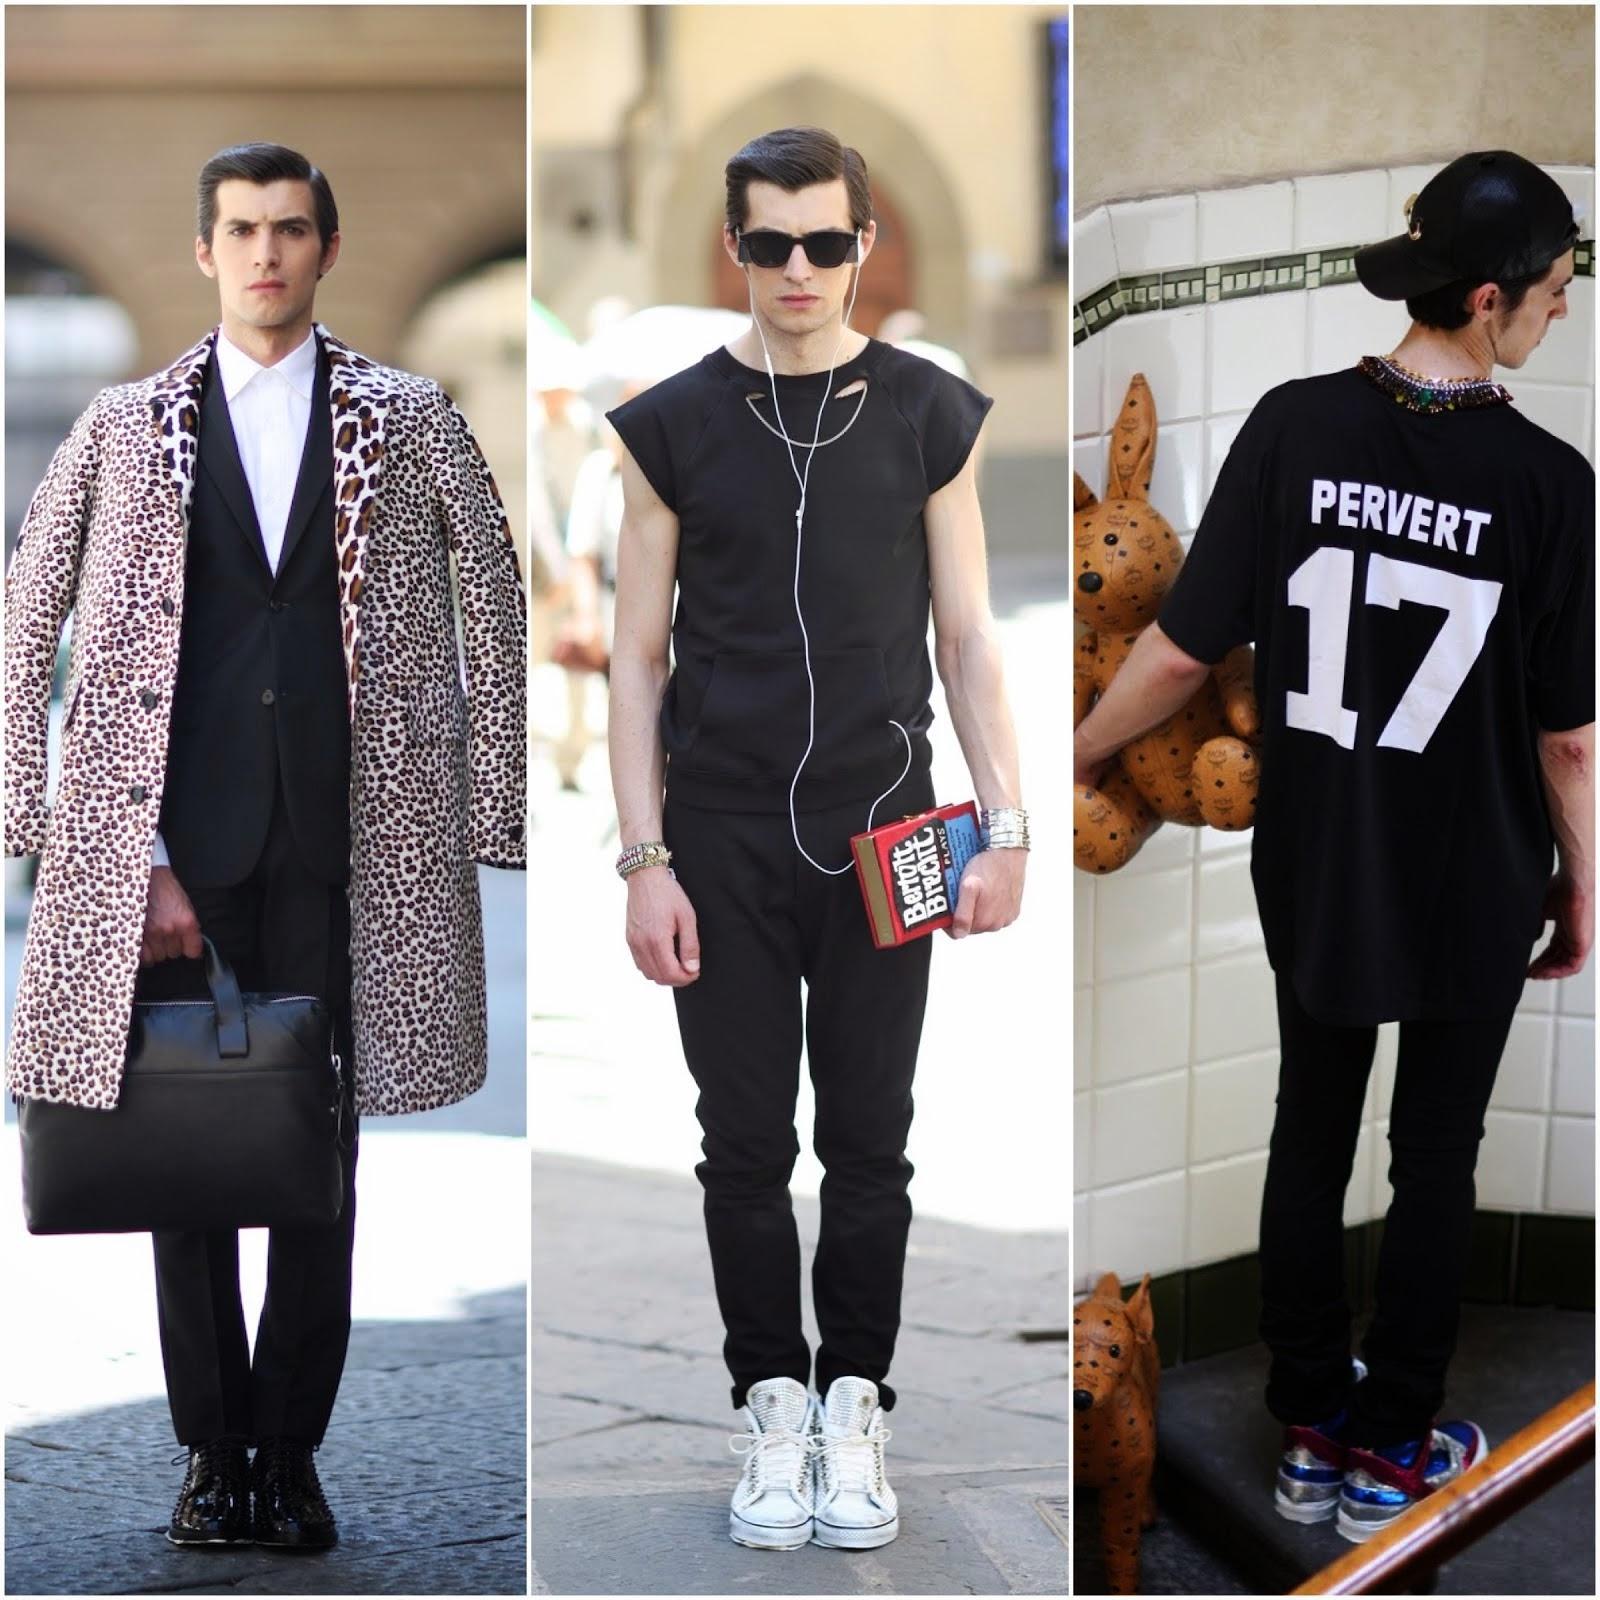 00O00 Menswear Blog: Luisa Via Roma Firenze4Ever Stylelab series